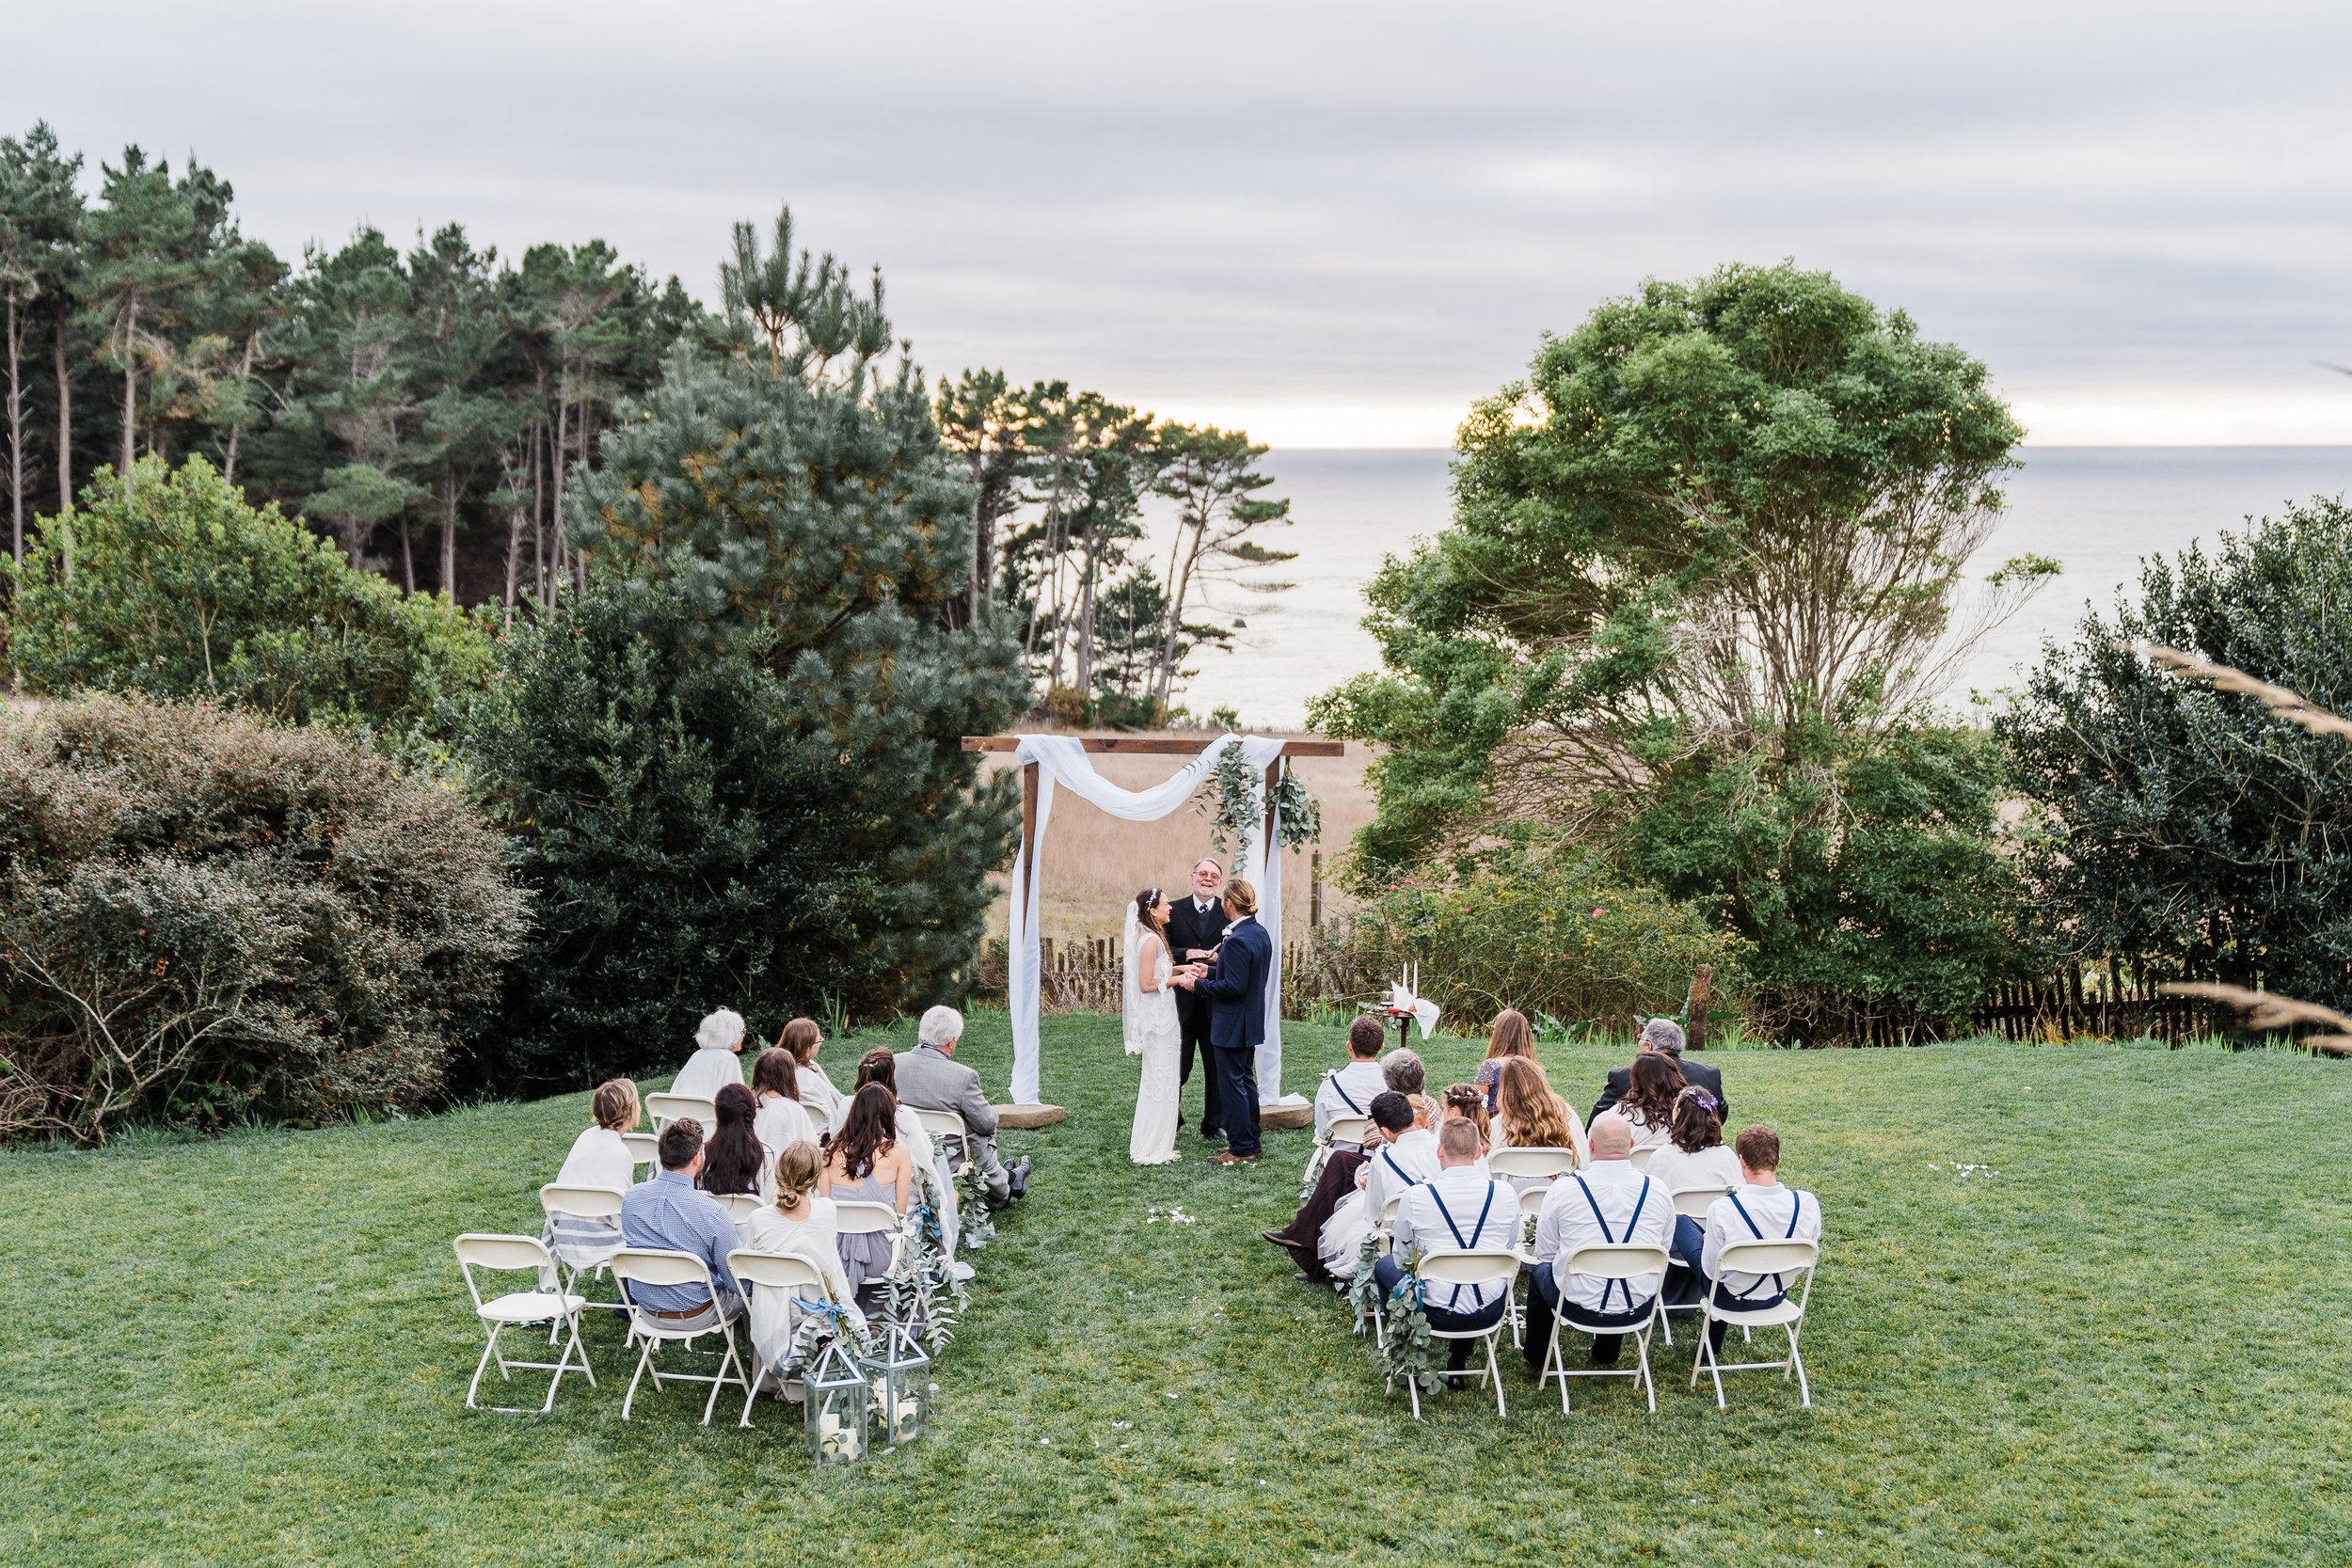 switzer-farm-wedding-westport-brandon-bibbins-photograhy-fine-art-062.jpg